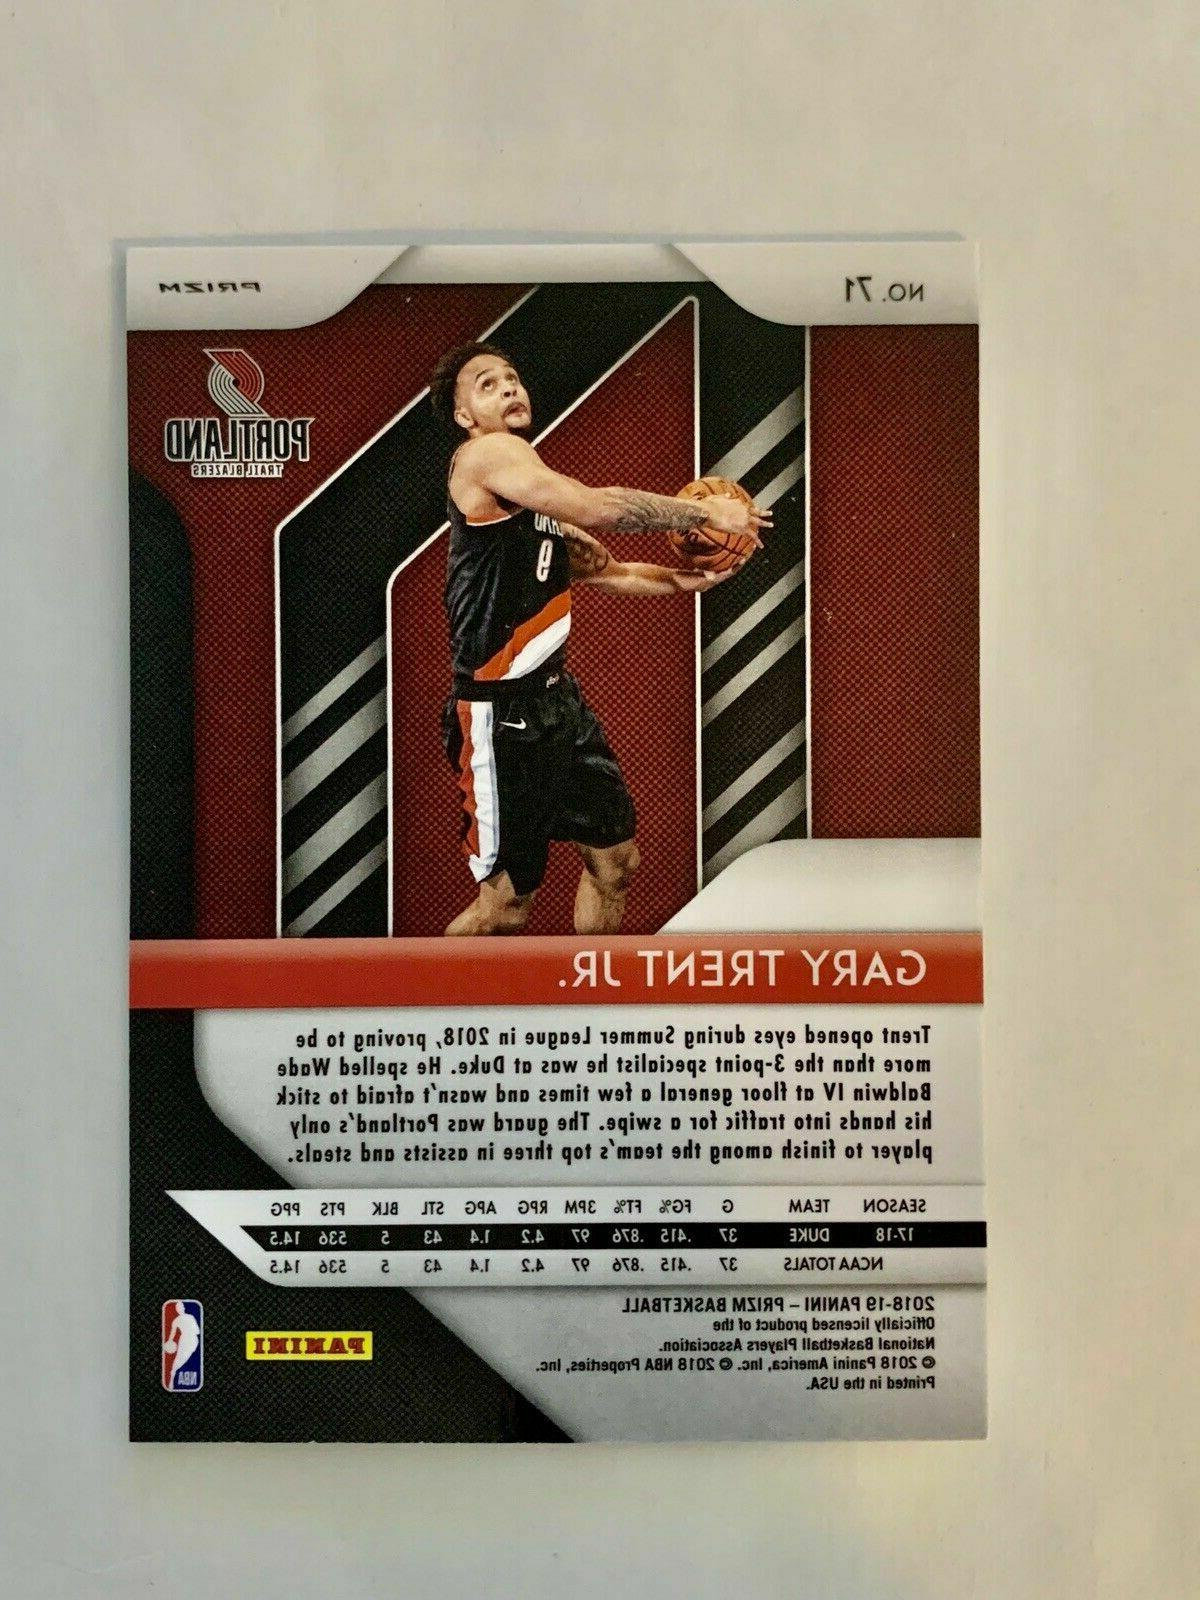 2018-19 Trent Jr RC Portland Trail Blazers Red Hot